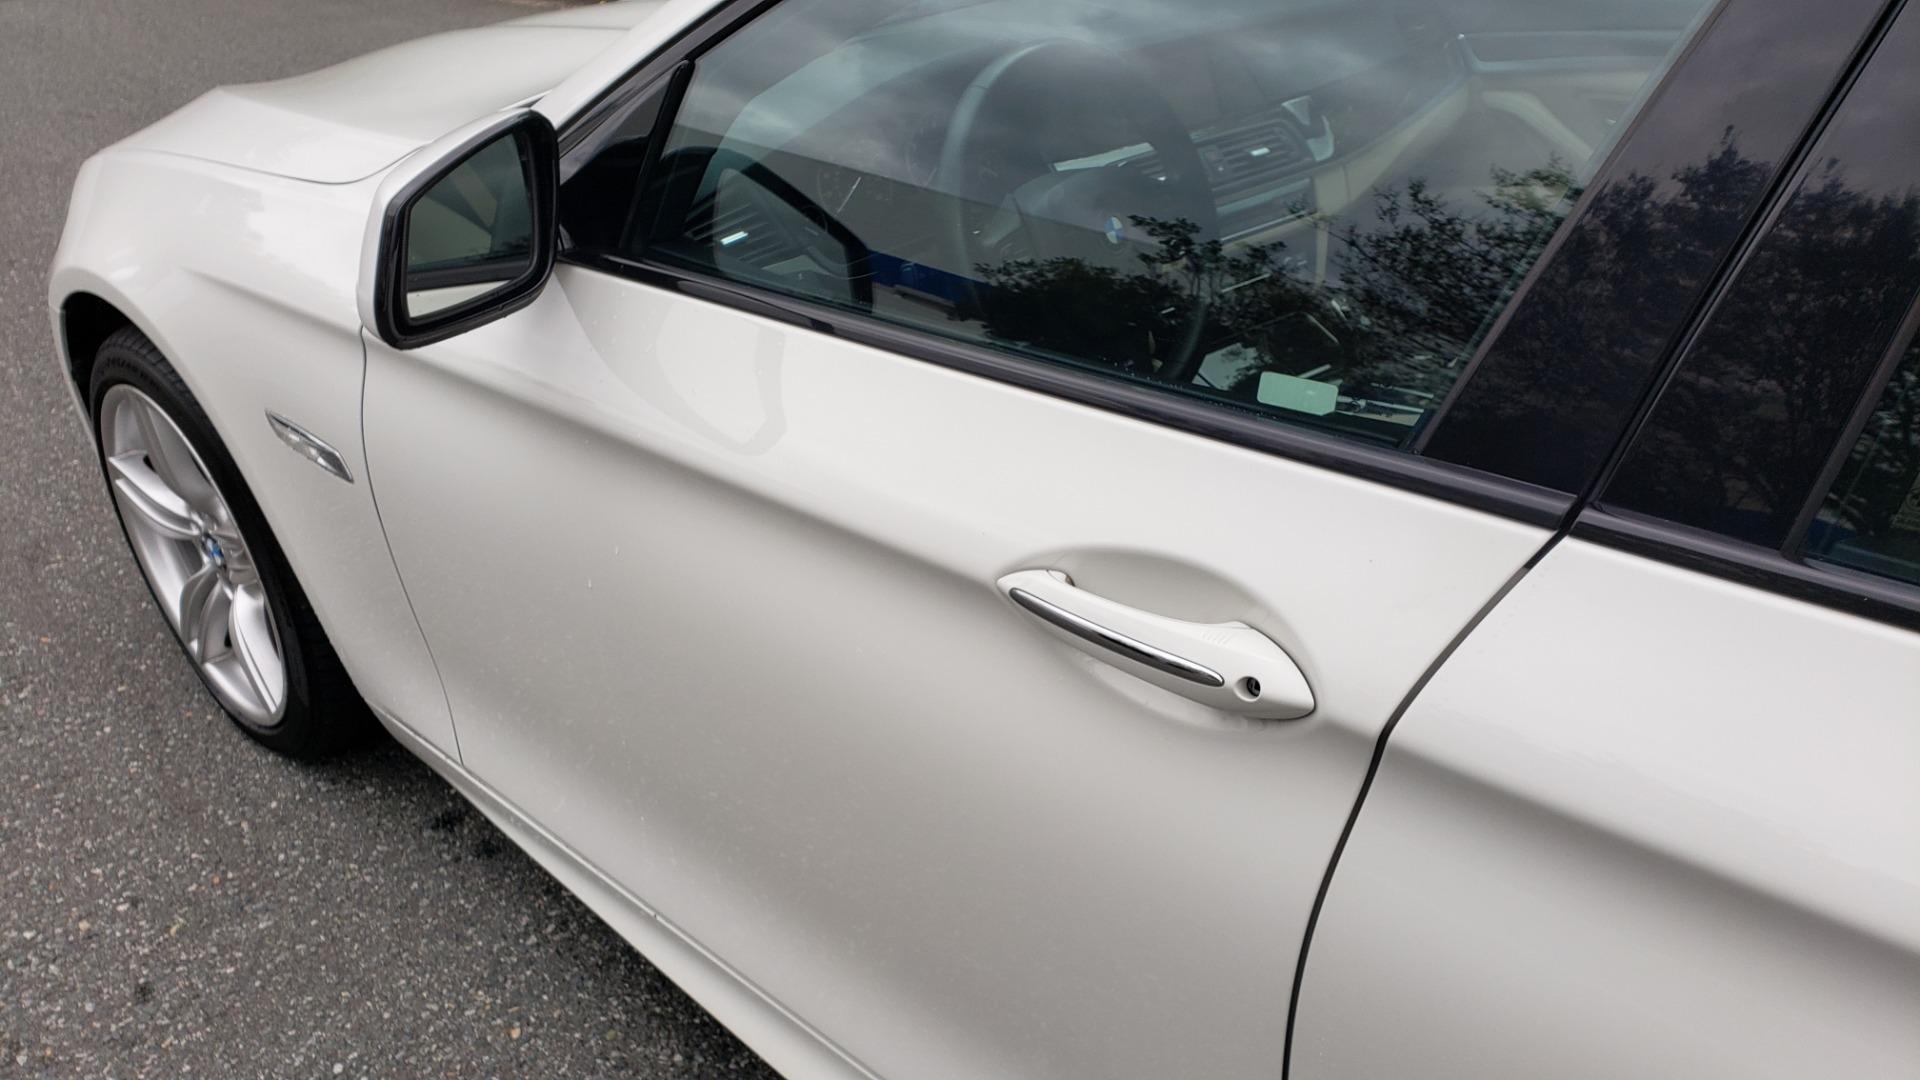 Used 2012 BMW 5 SERIES 550I M SPORT / NAV / CONV PKG / SUNROOF / PREM SND / REARVIEW for sale Sold at Formula Imports in Charlotte NC 28227 10